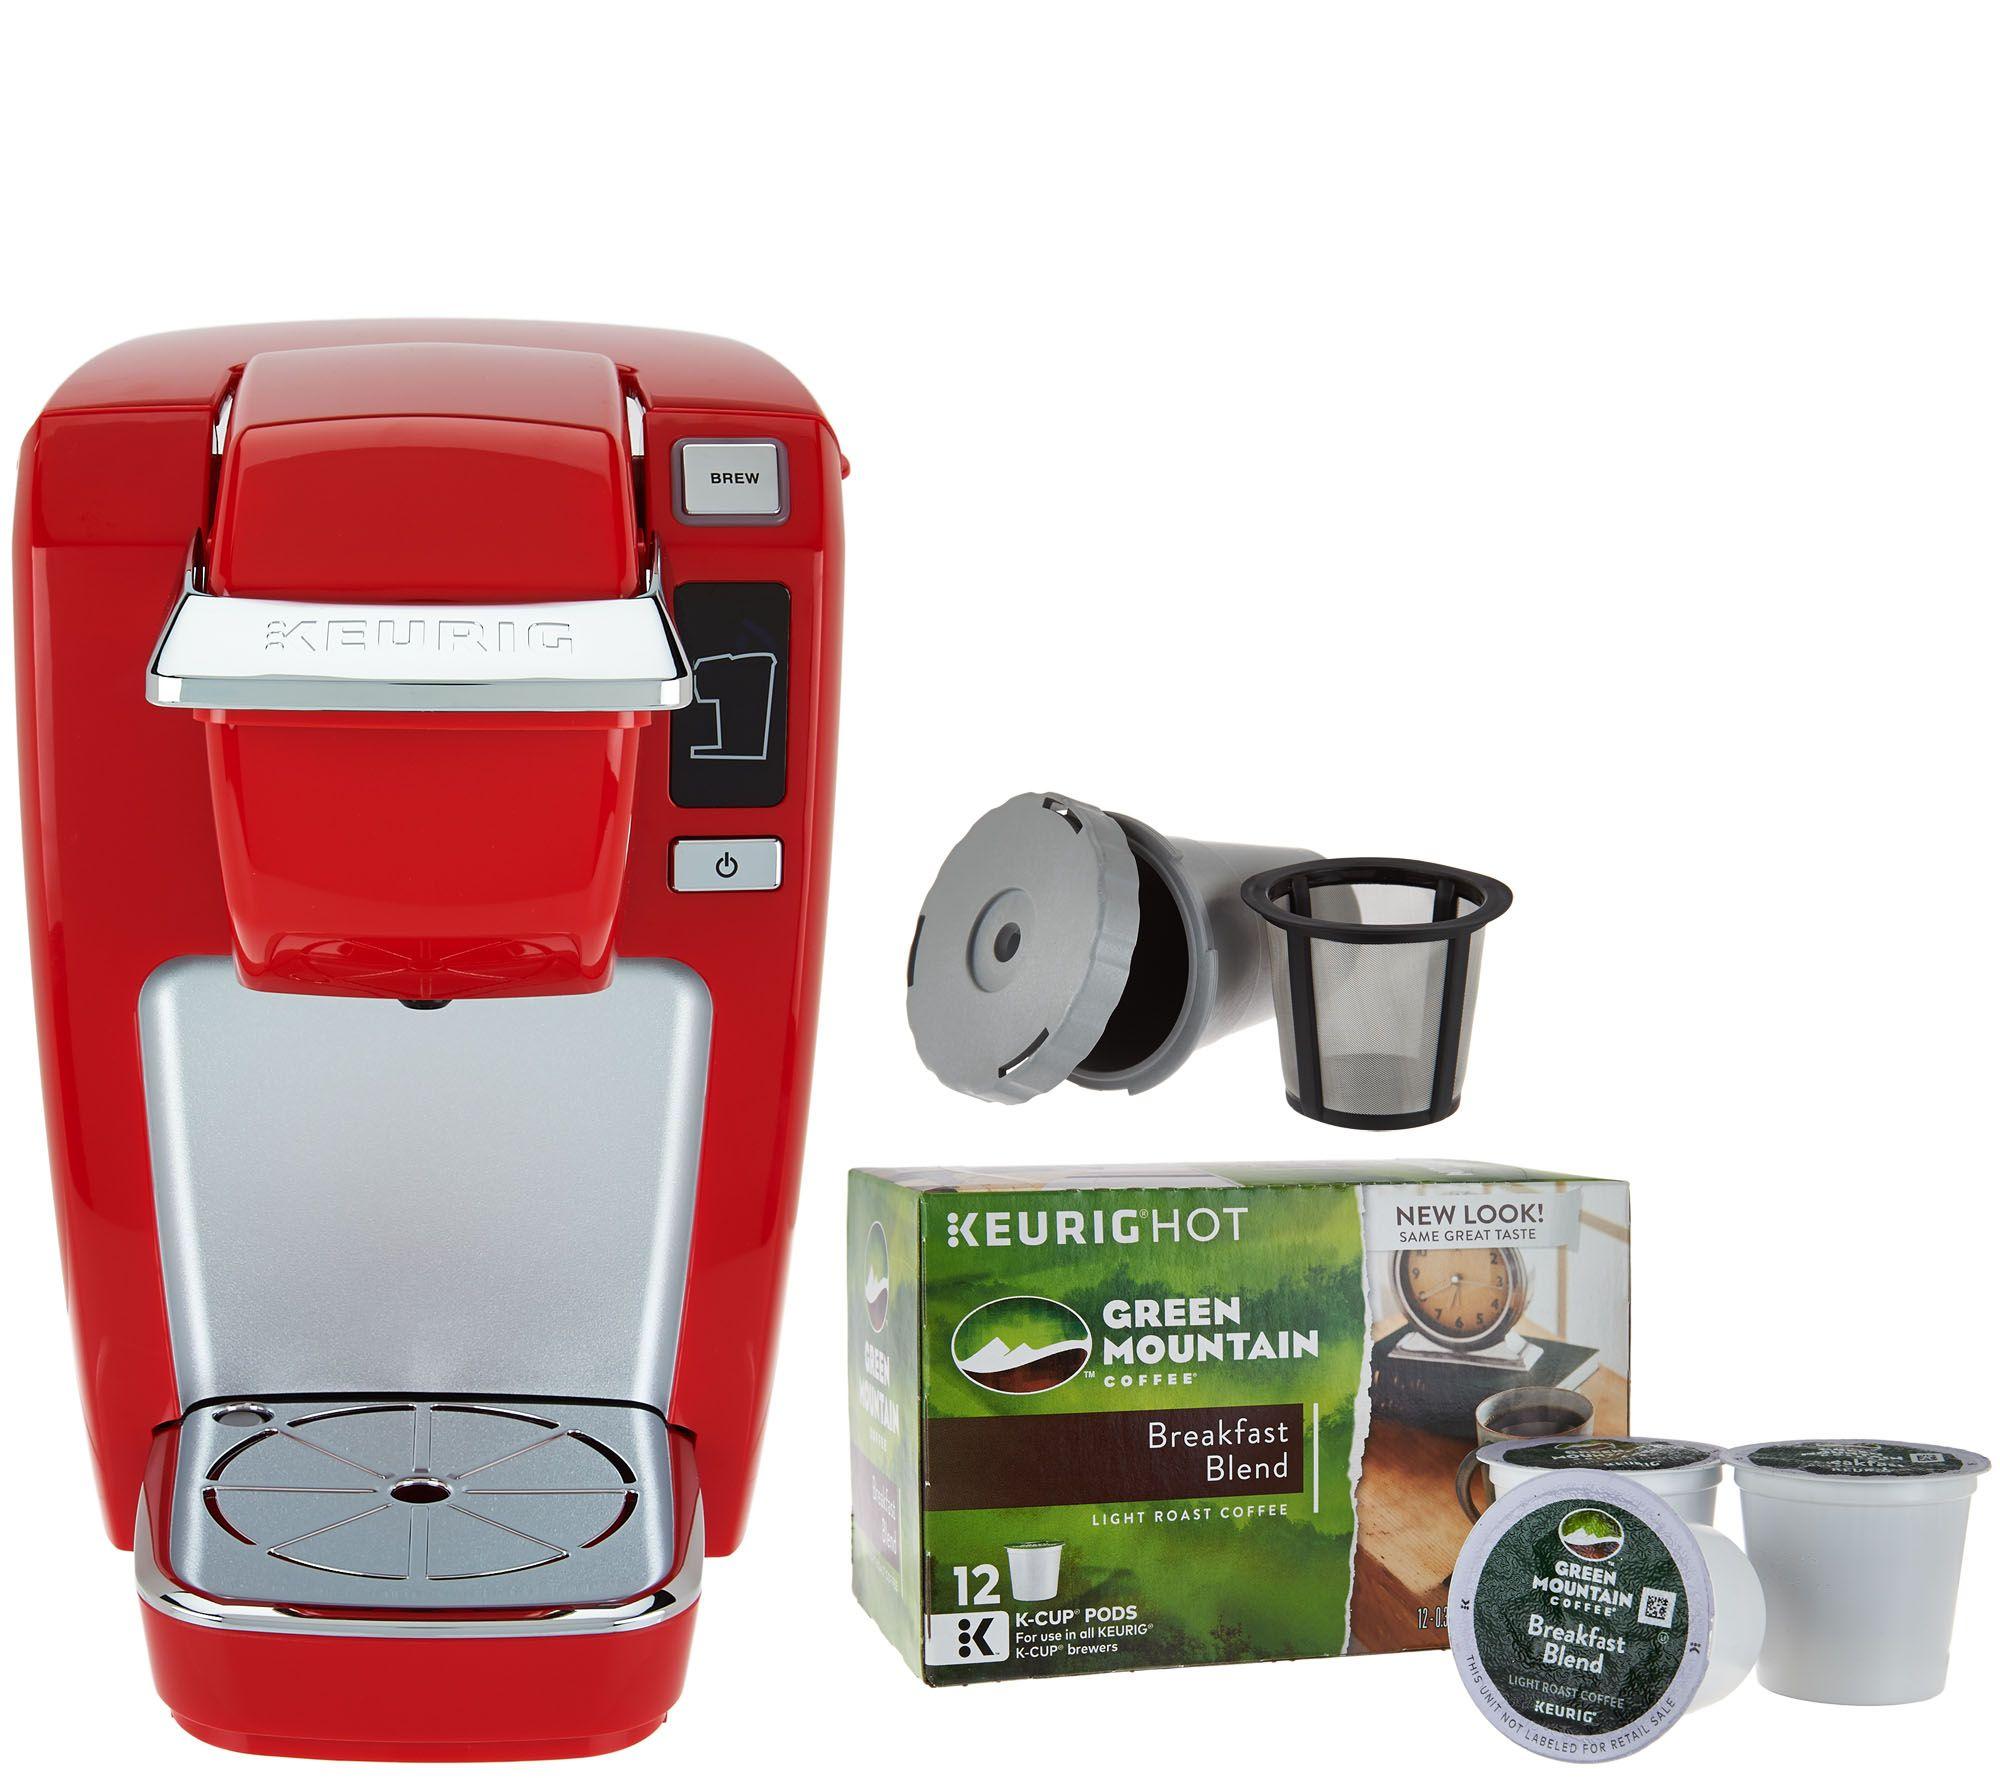 K cup coffee maker coffee hamilton beach 2way flexbrew for Keurig coffee maker